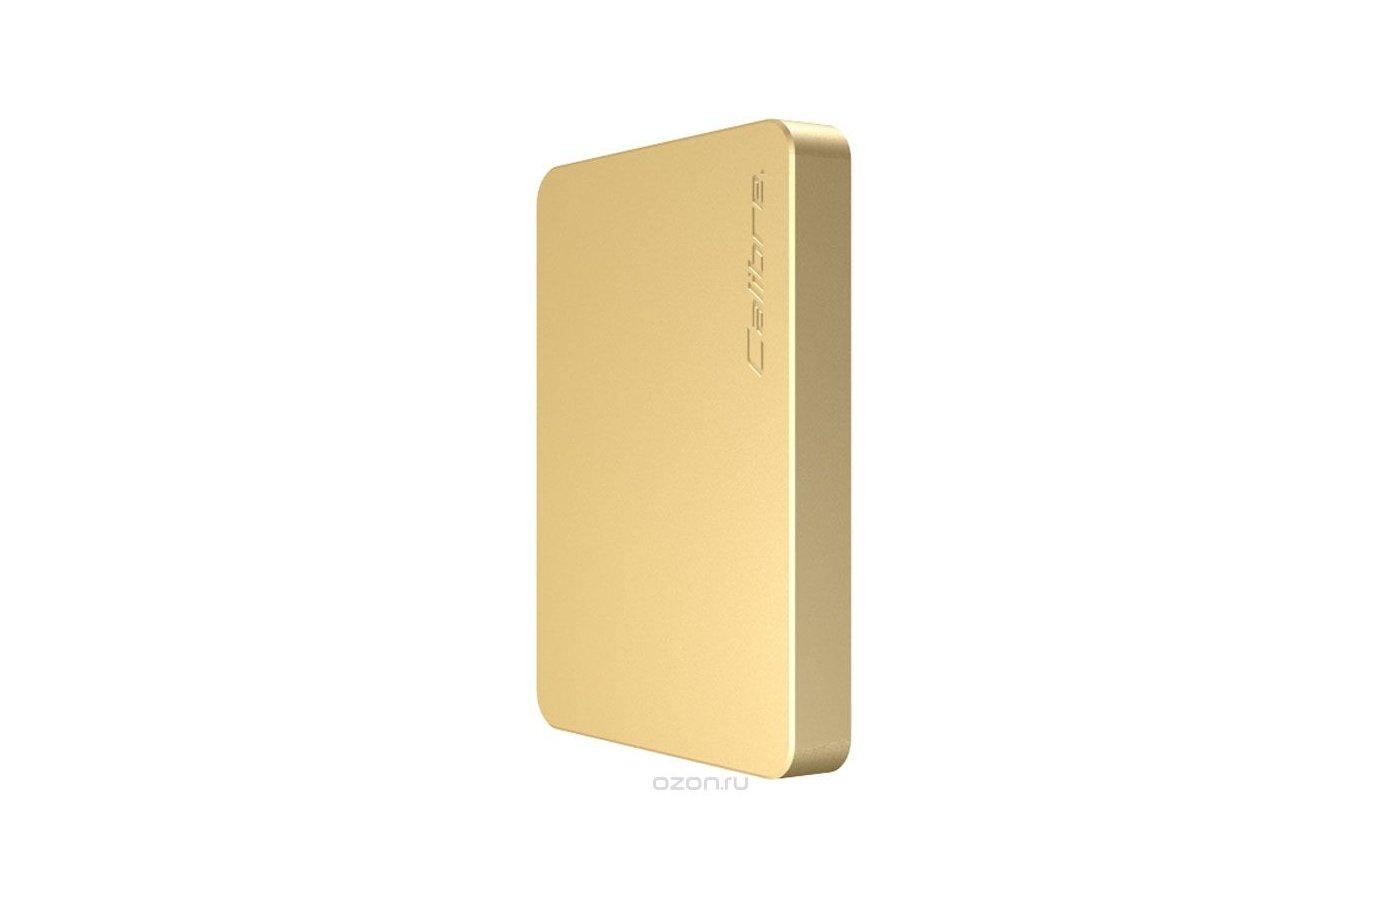 Портативный аккумулятор Calibre ULTRA GO NANO GOLD 2500 mAh FUNA025G1